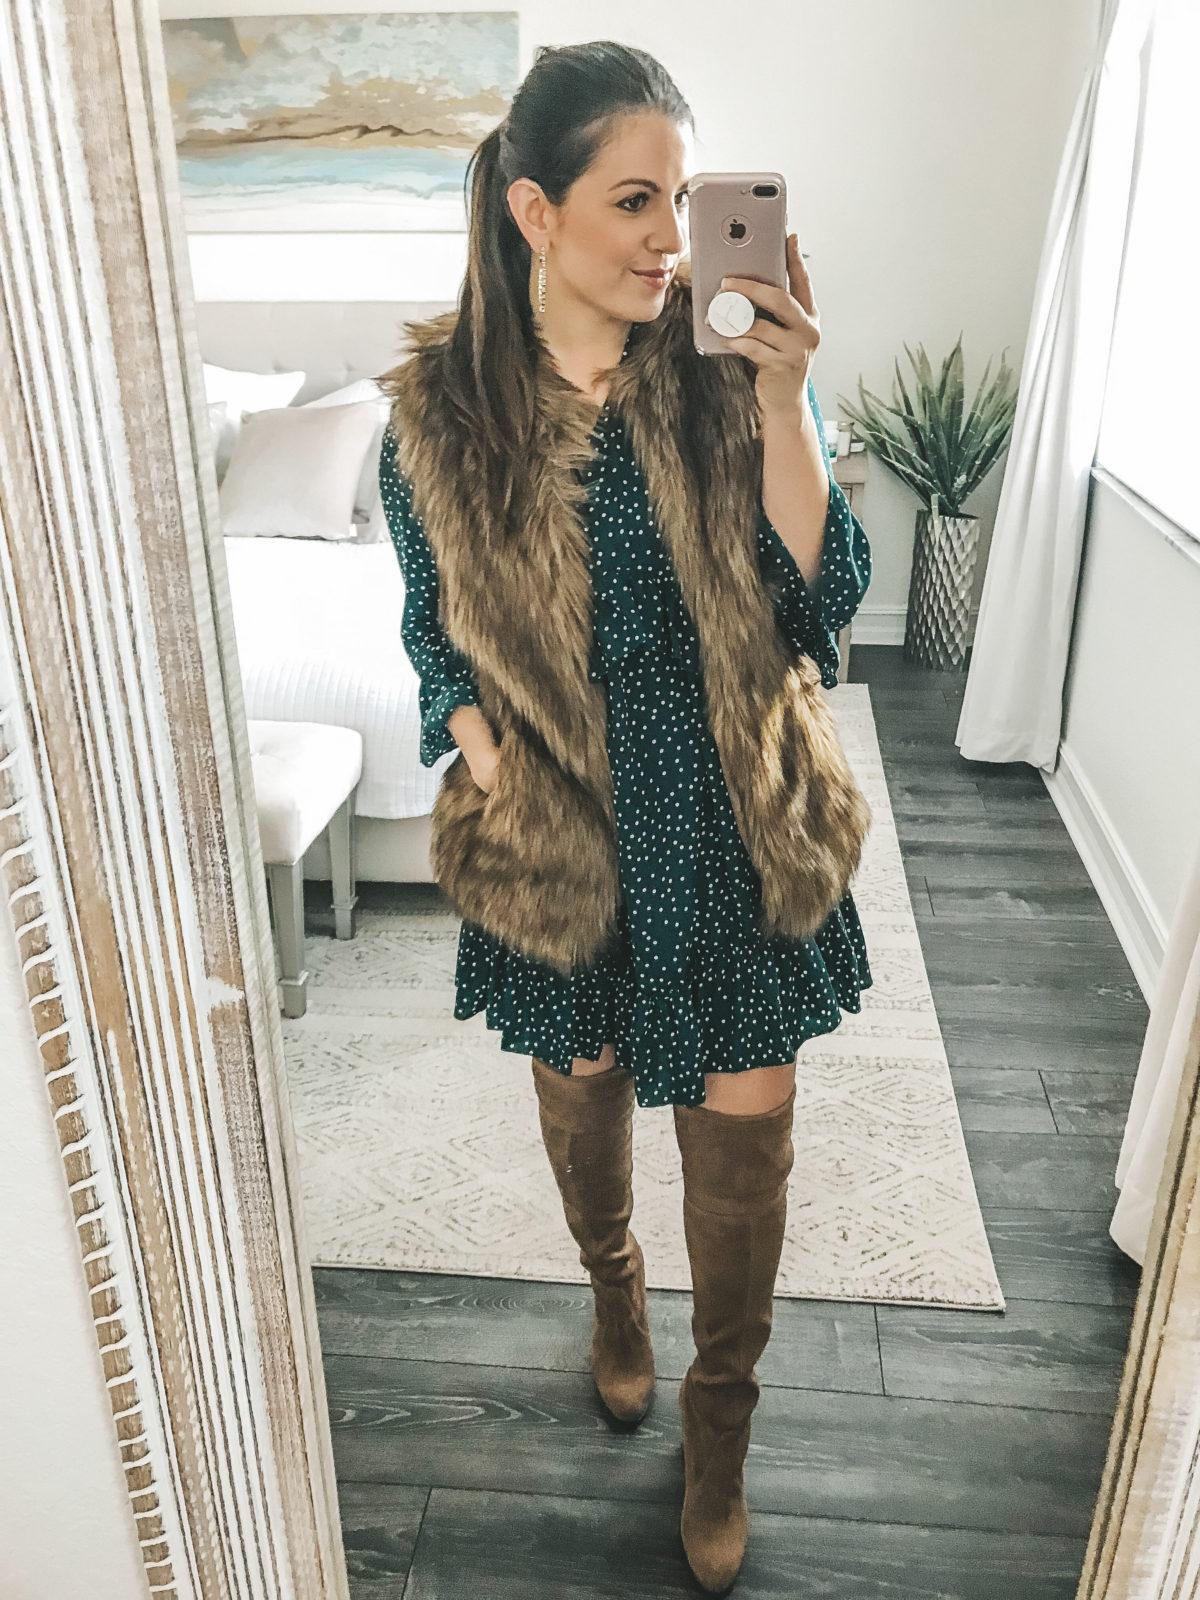 Ruffle Polka Dot Loose Swing Dress, Amazon Fashion Dress